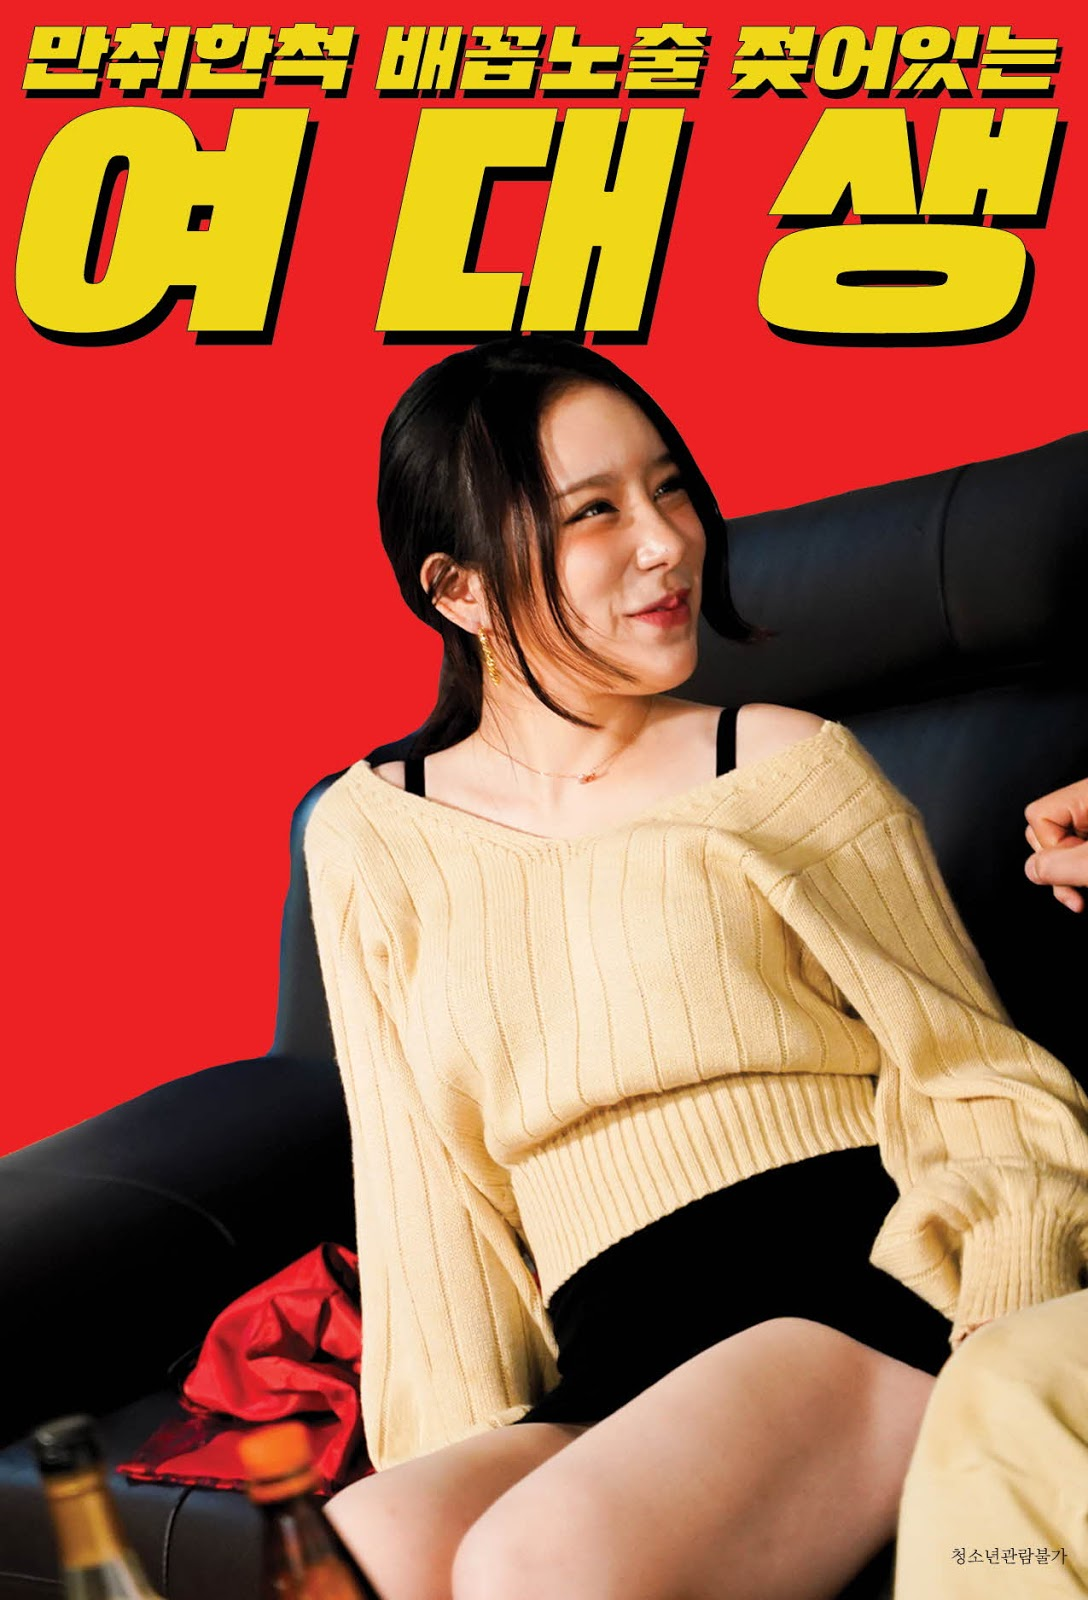 Pretending To Be Drunk, College Girl Exposed Wet Belly Full Korea 18+ Adult Movie